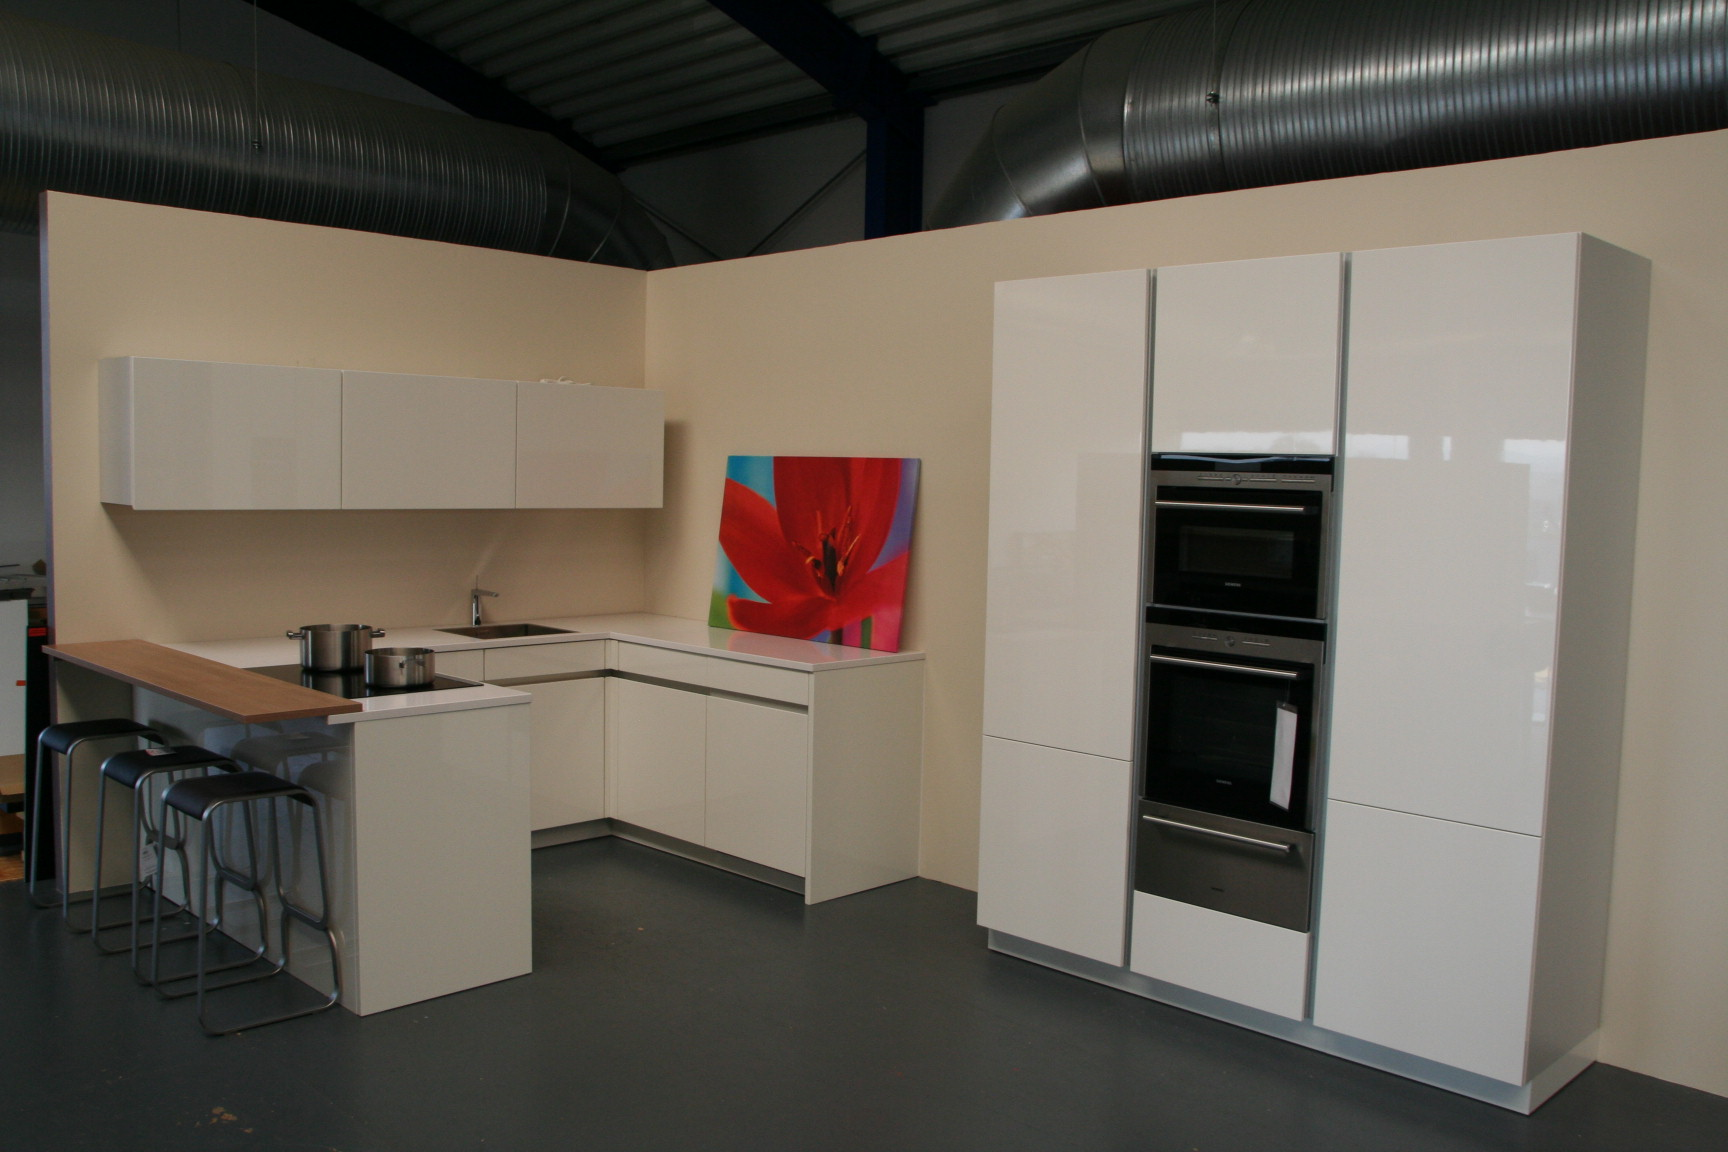 Küche g form modern – sehremini